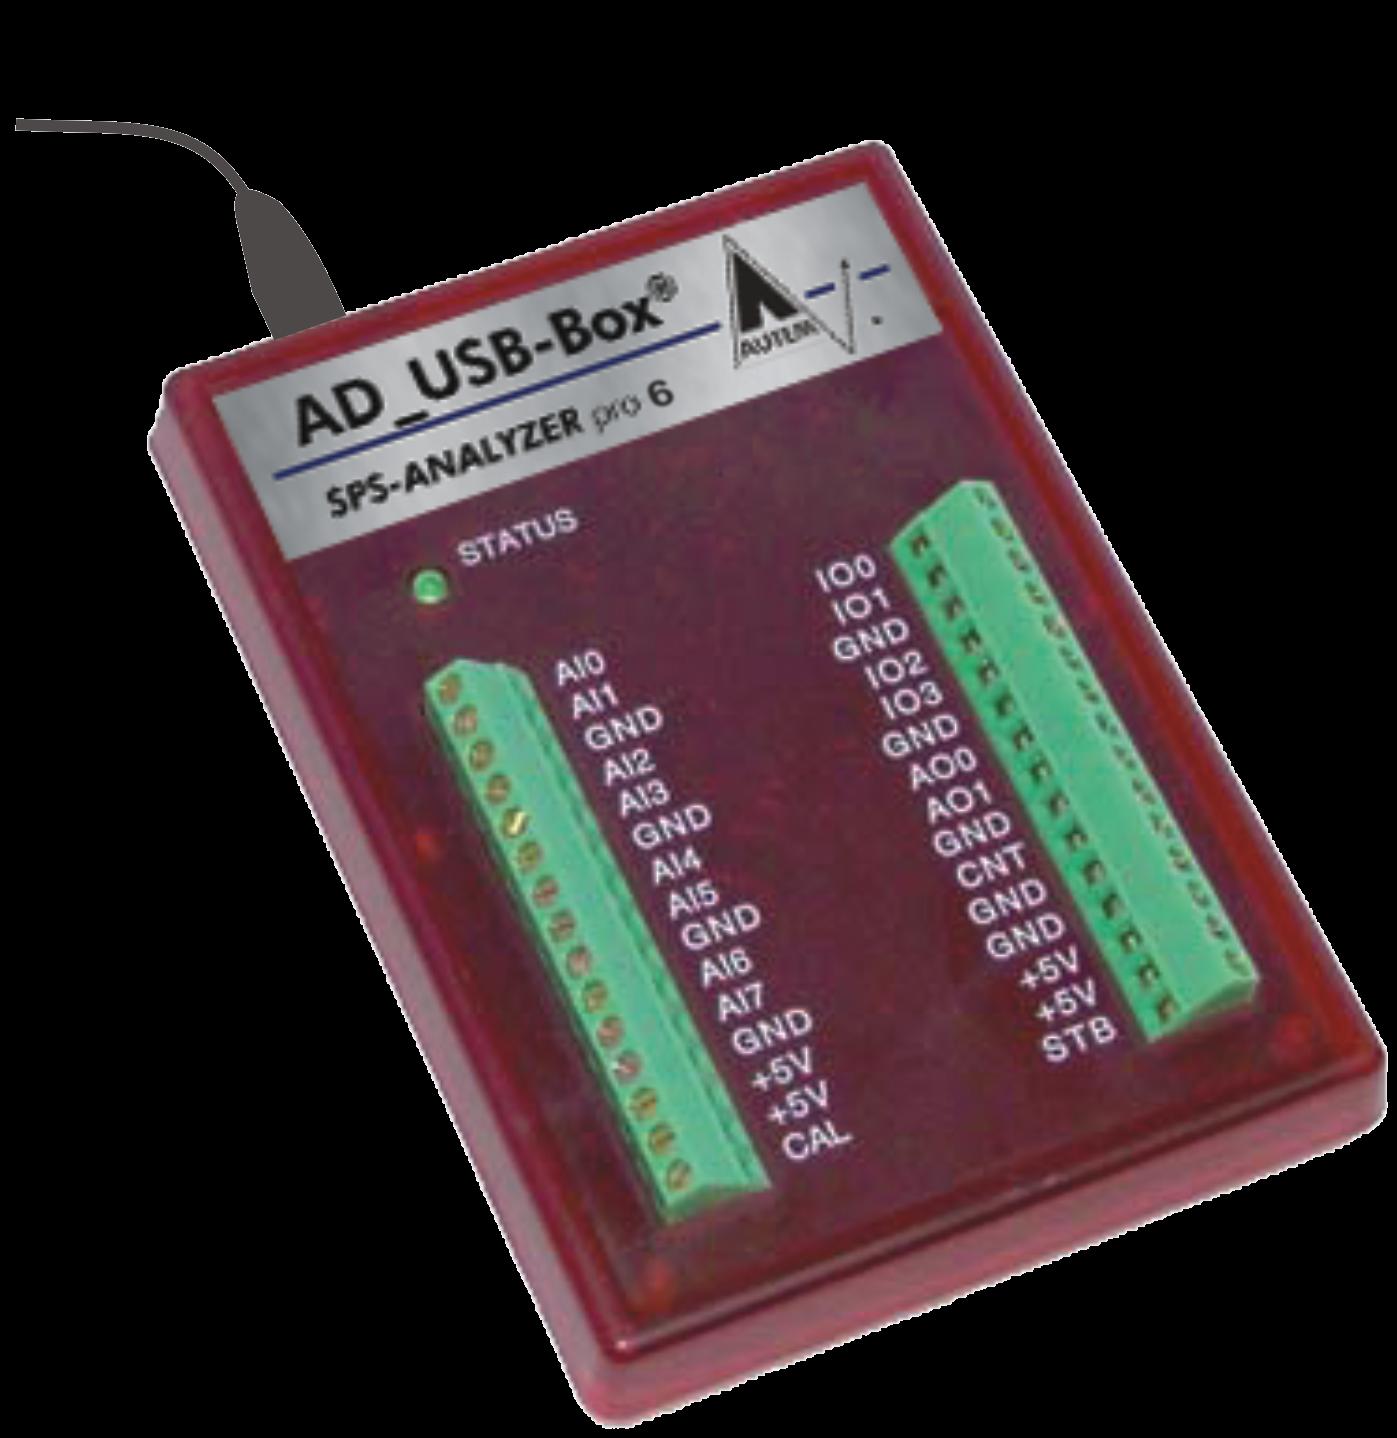 AD_USB-Box